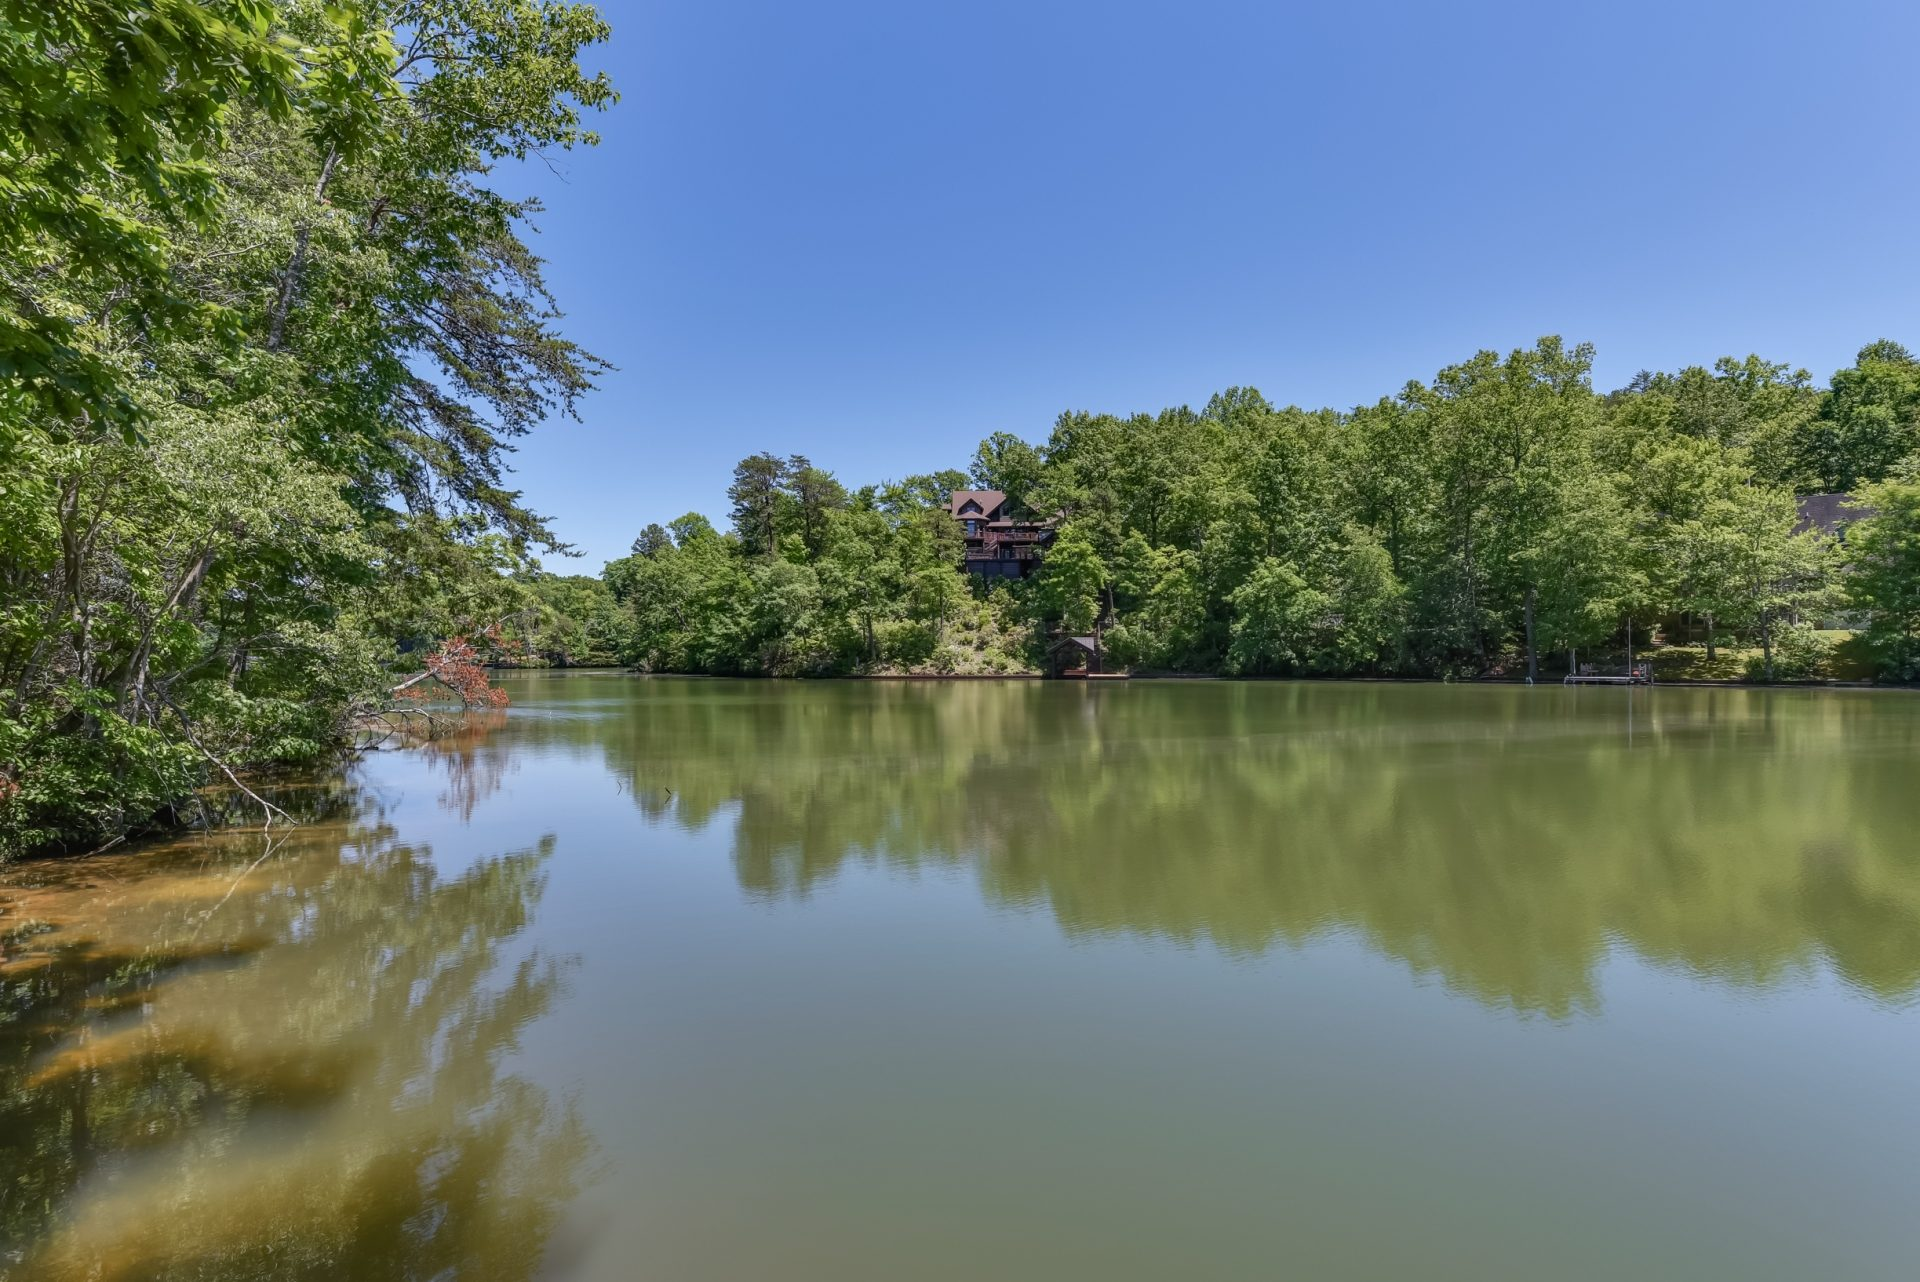 Lake Lanier, updated log home on the water: 512 Caledonia Loop, Landrum SC